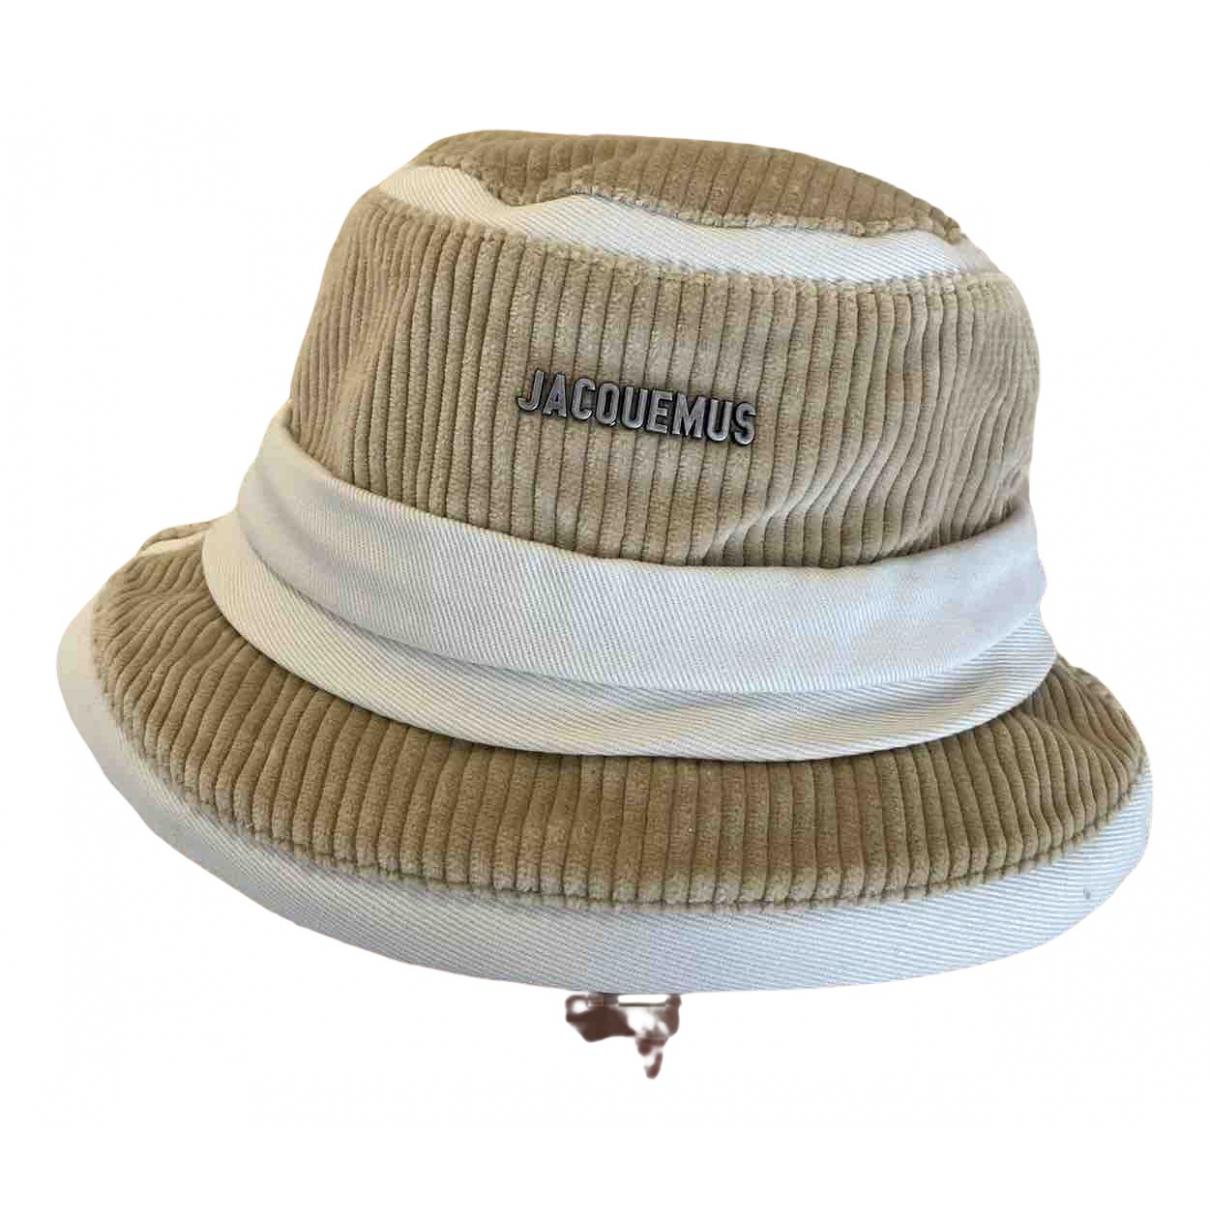 Sombrero / gorro Jacquemus